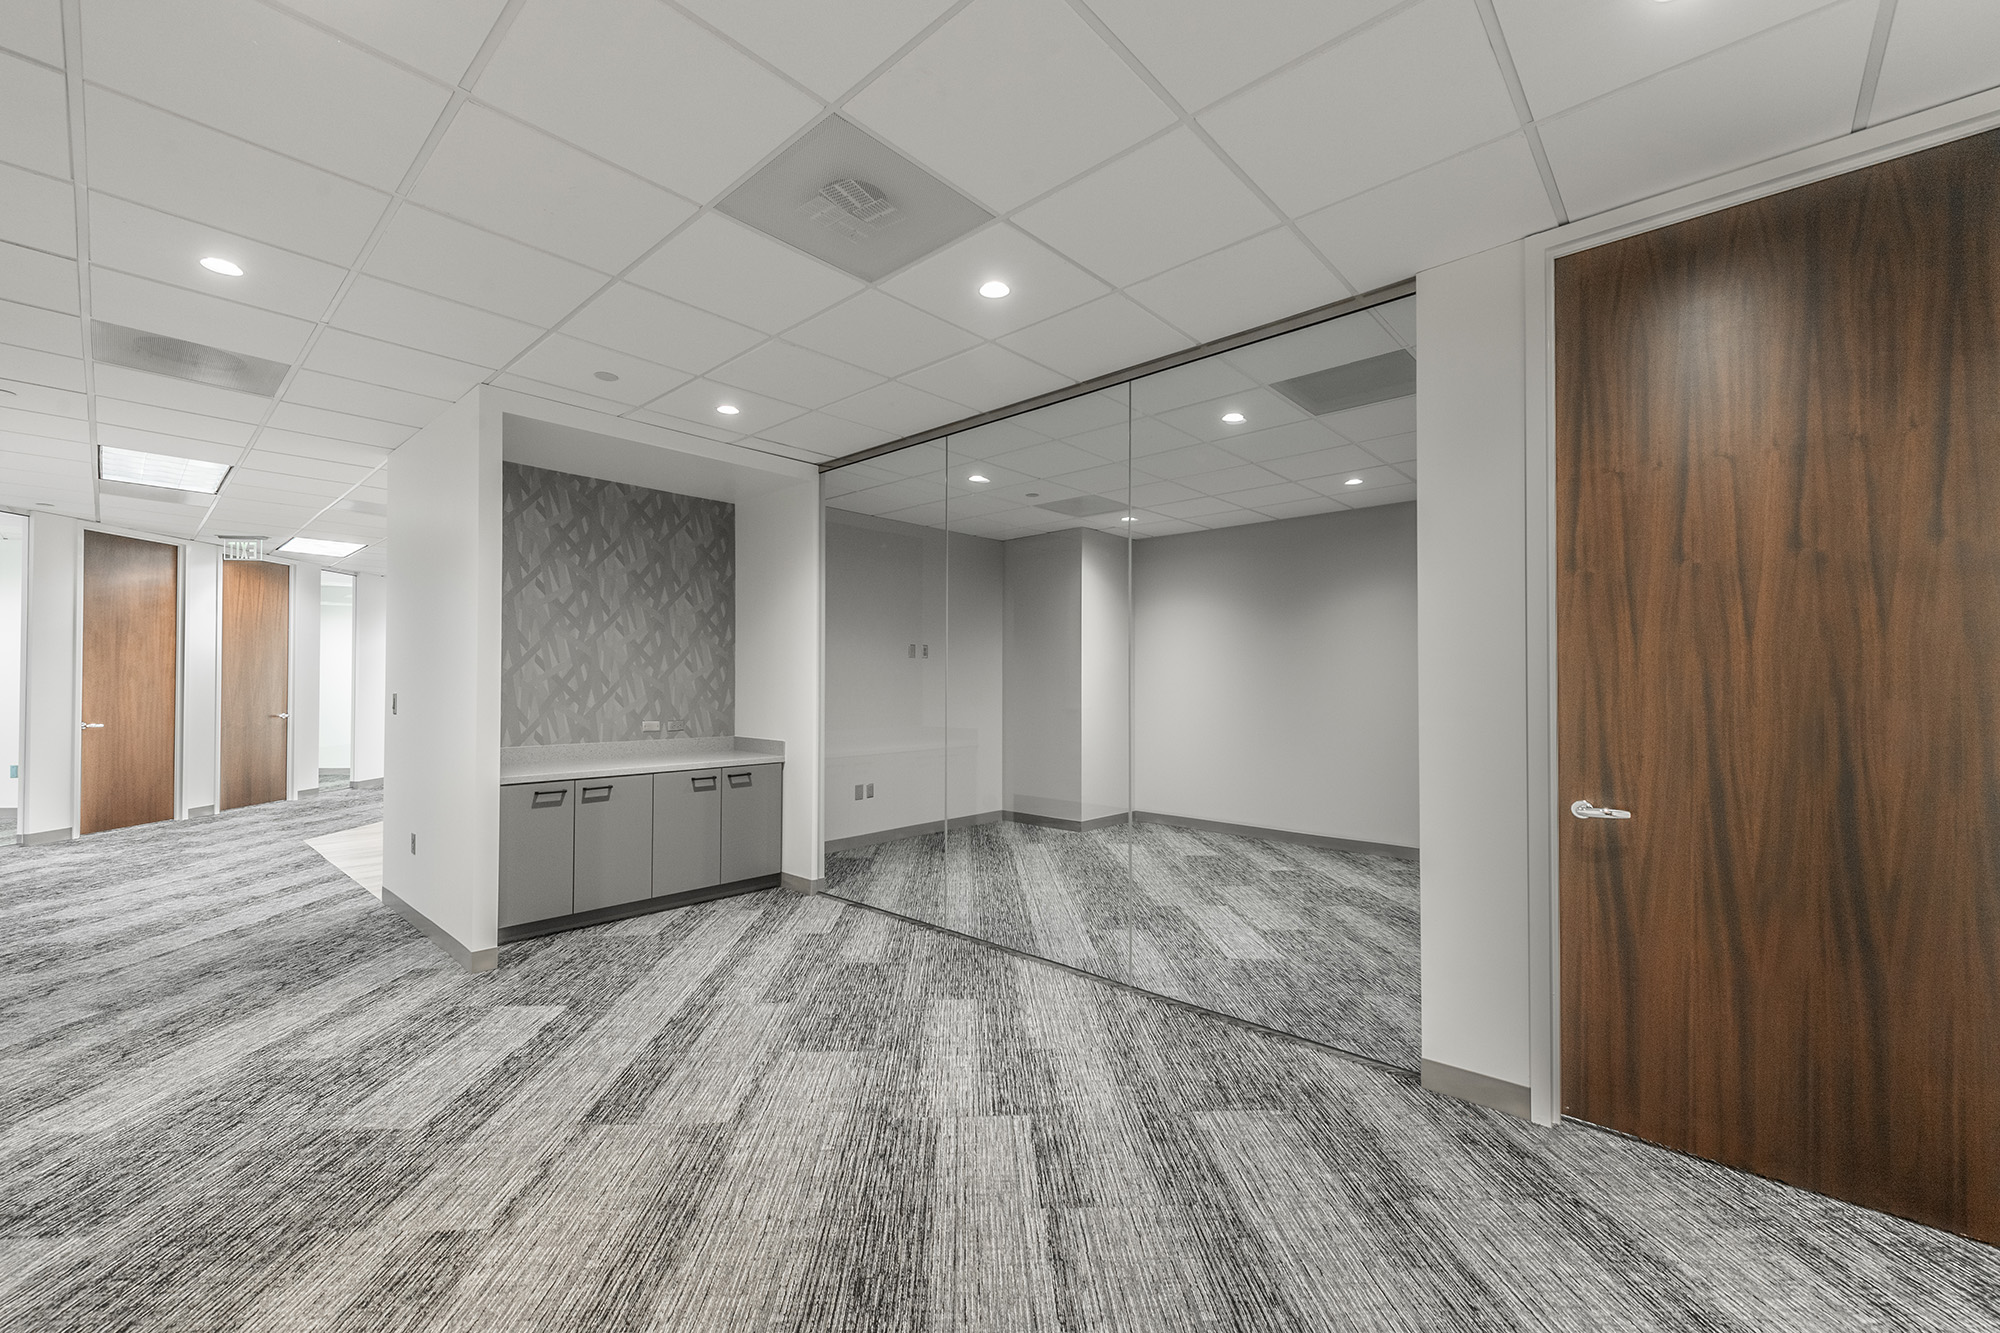 Assets Construction Portfolio: Buckhead Tower